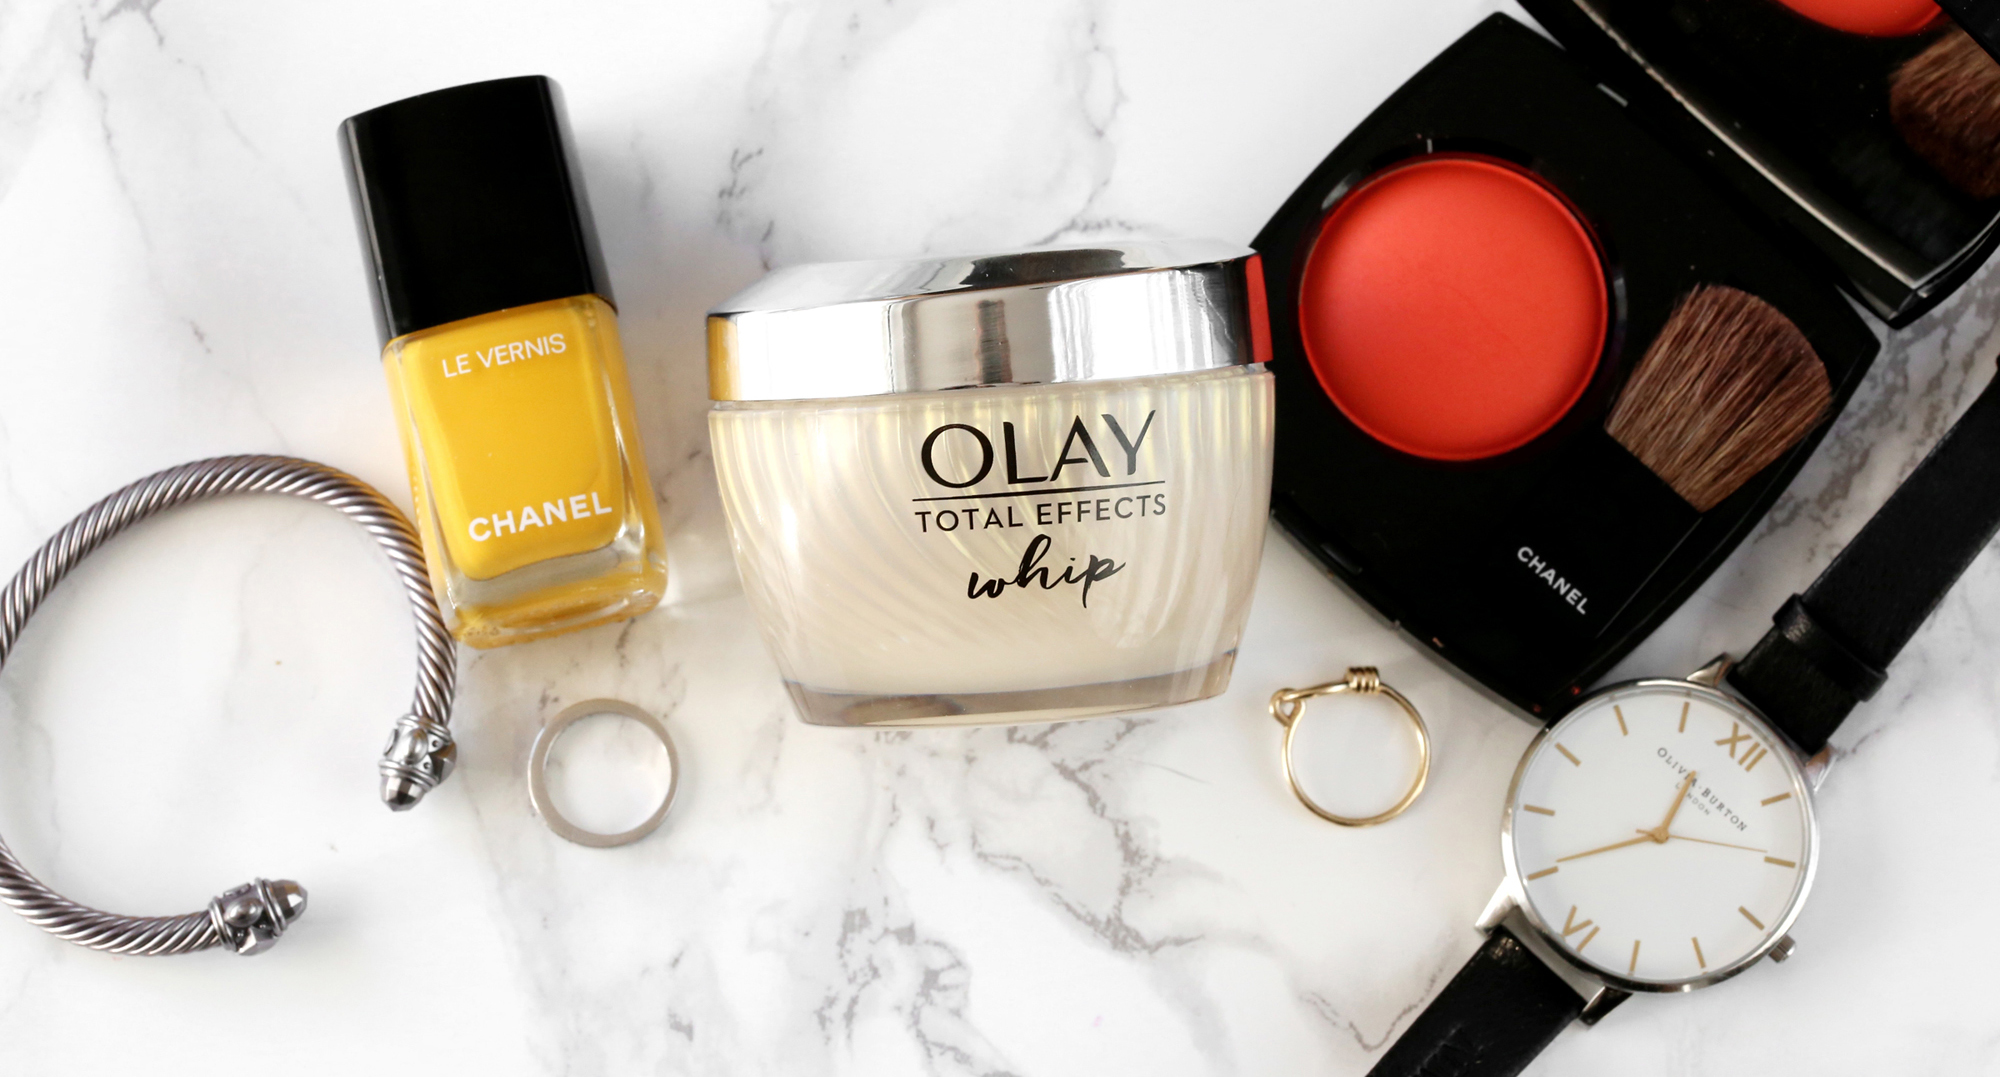 olay whips moisturizer review - woahstyle.com - beauty blog by nathalie martin_6774.jpg